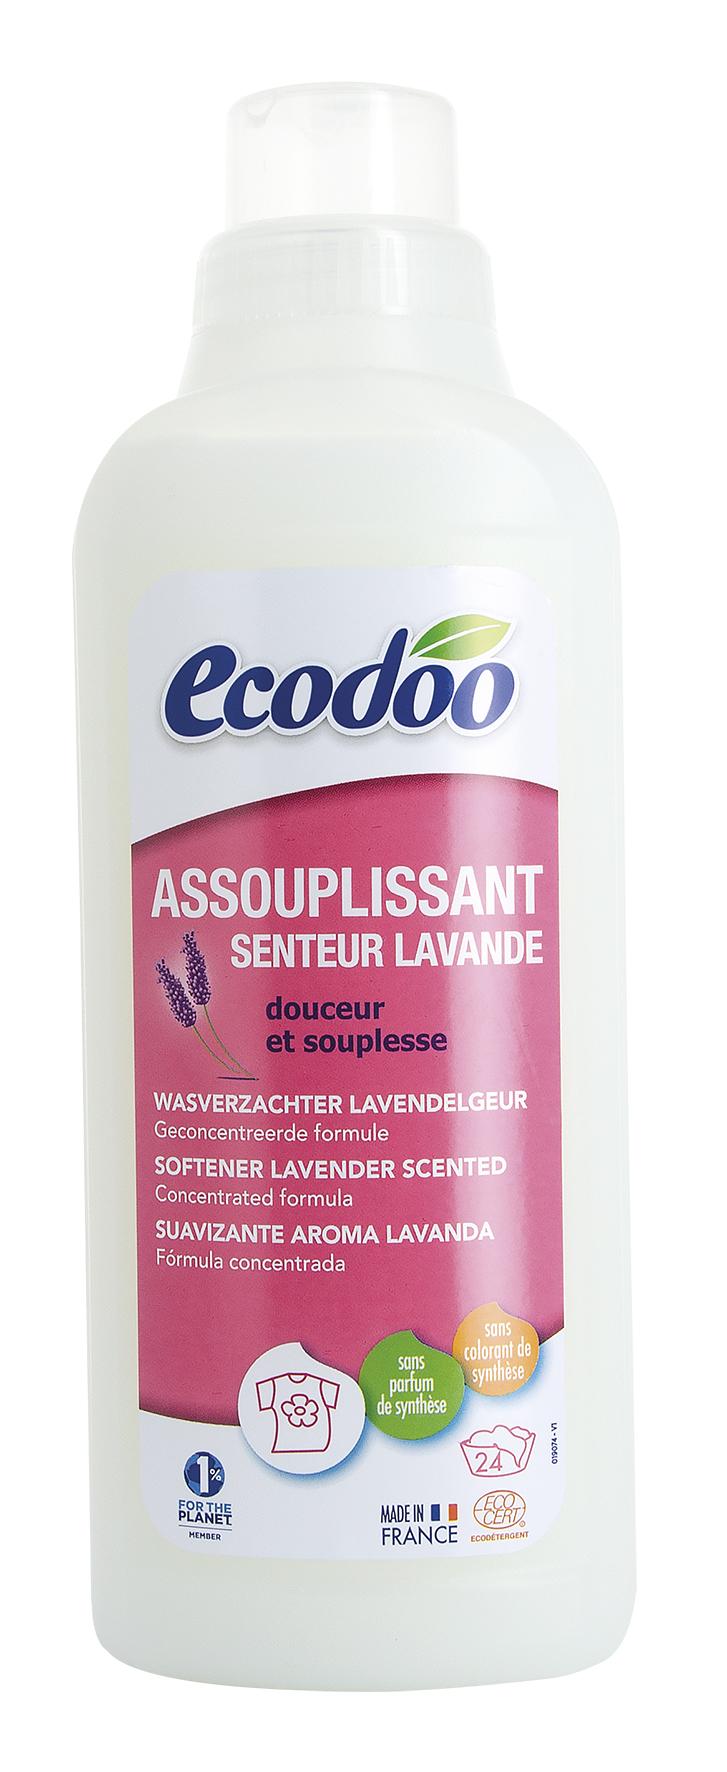 Assouplissant senteur lavande, Ecodoo (750 ml)